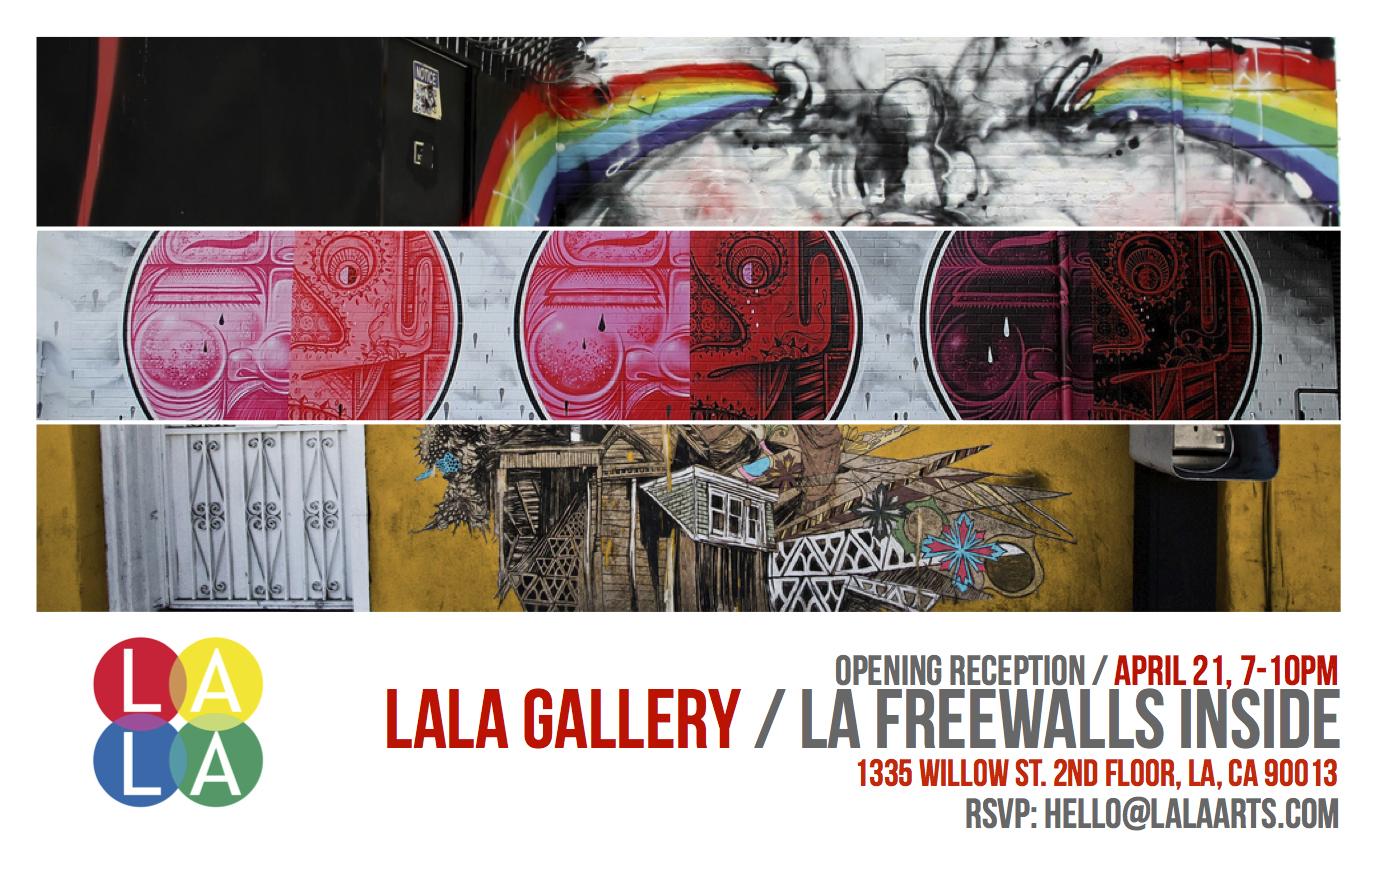 Quot La Freewalls Inside Quot Los Angeles Lala Gallery Opening